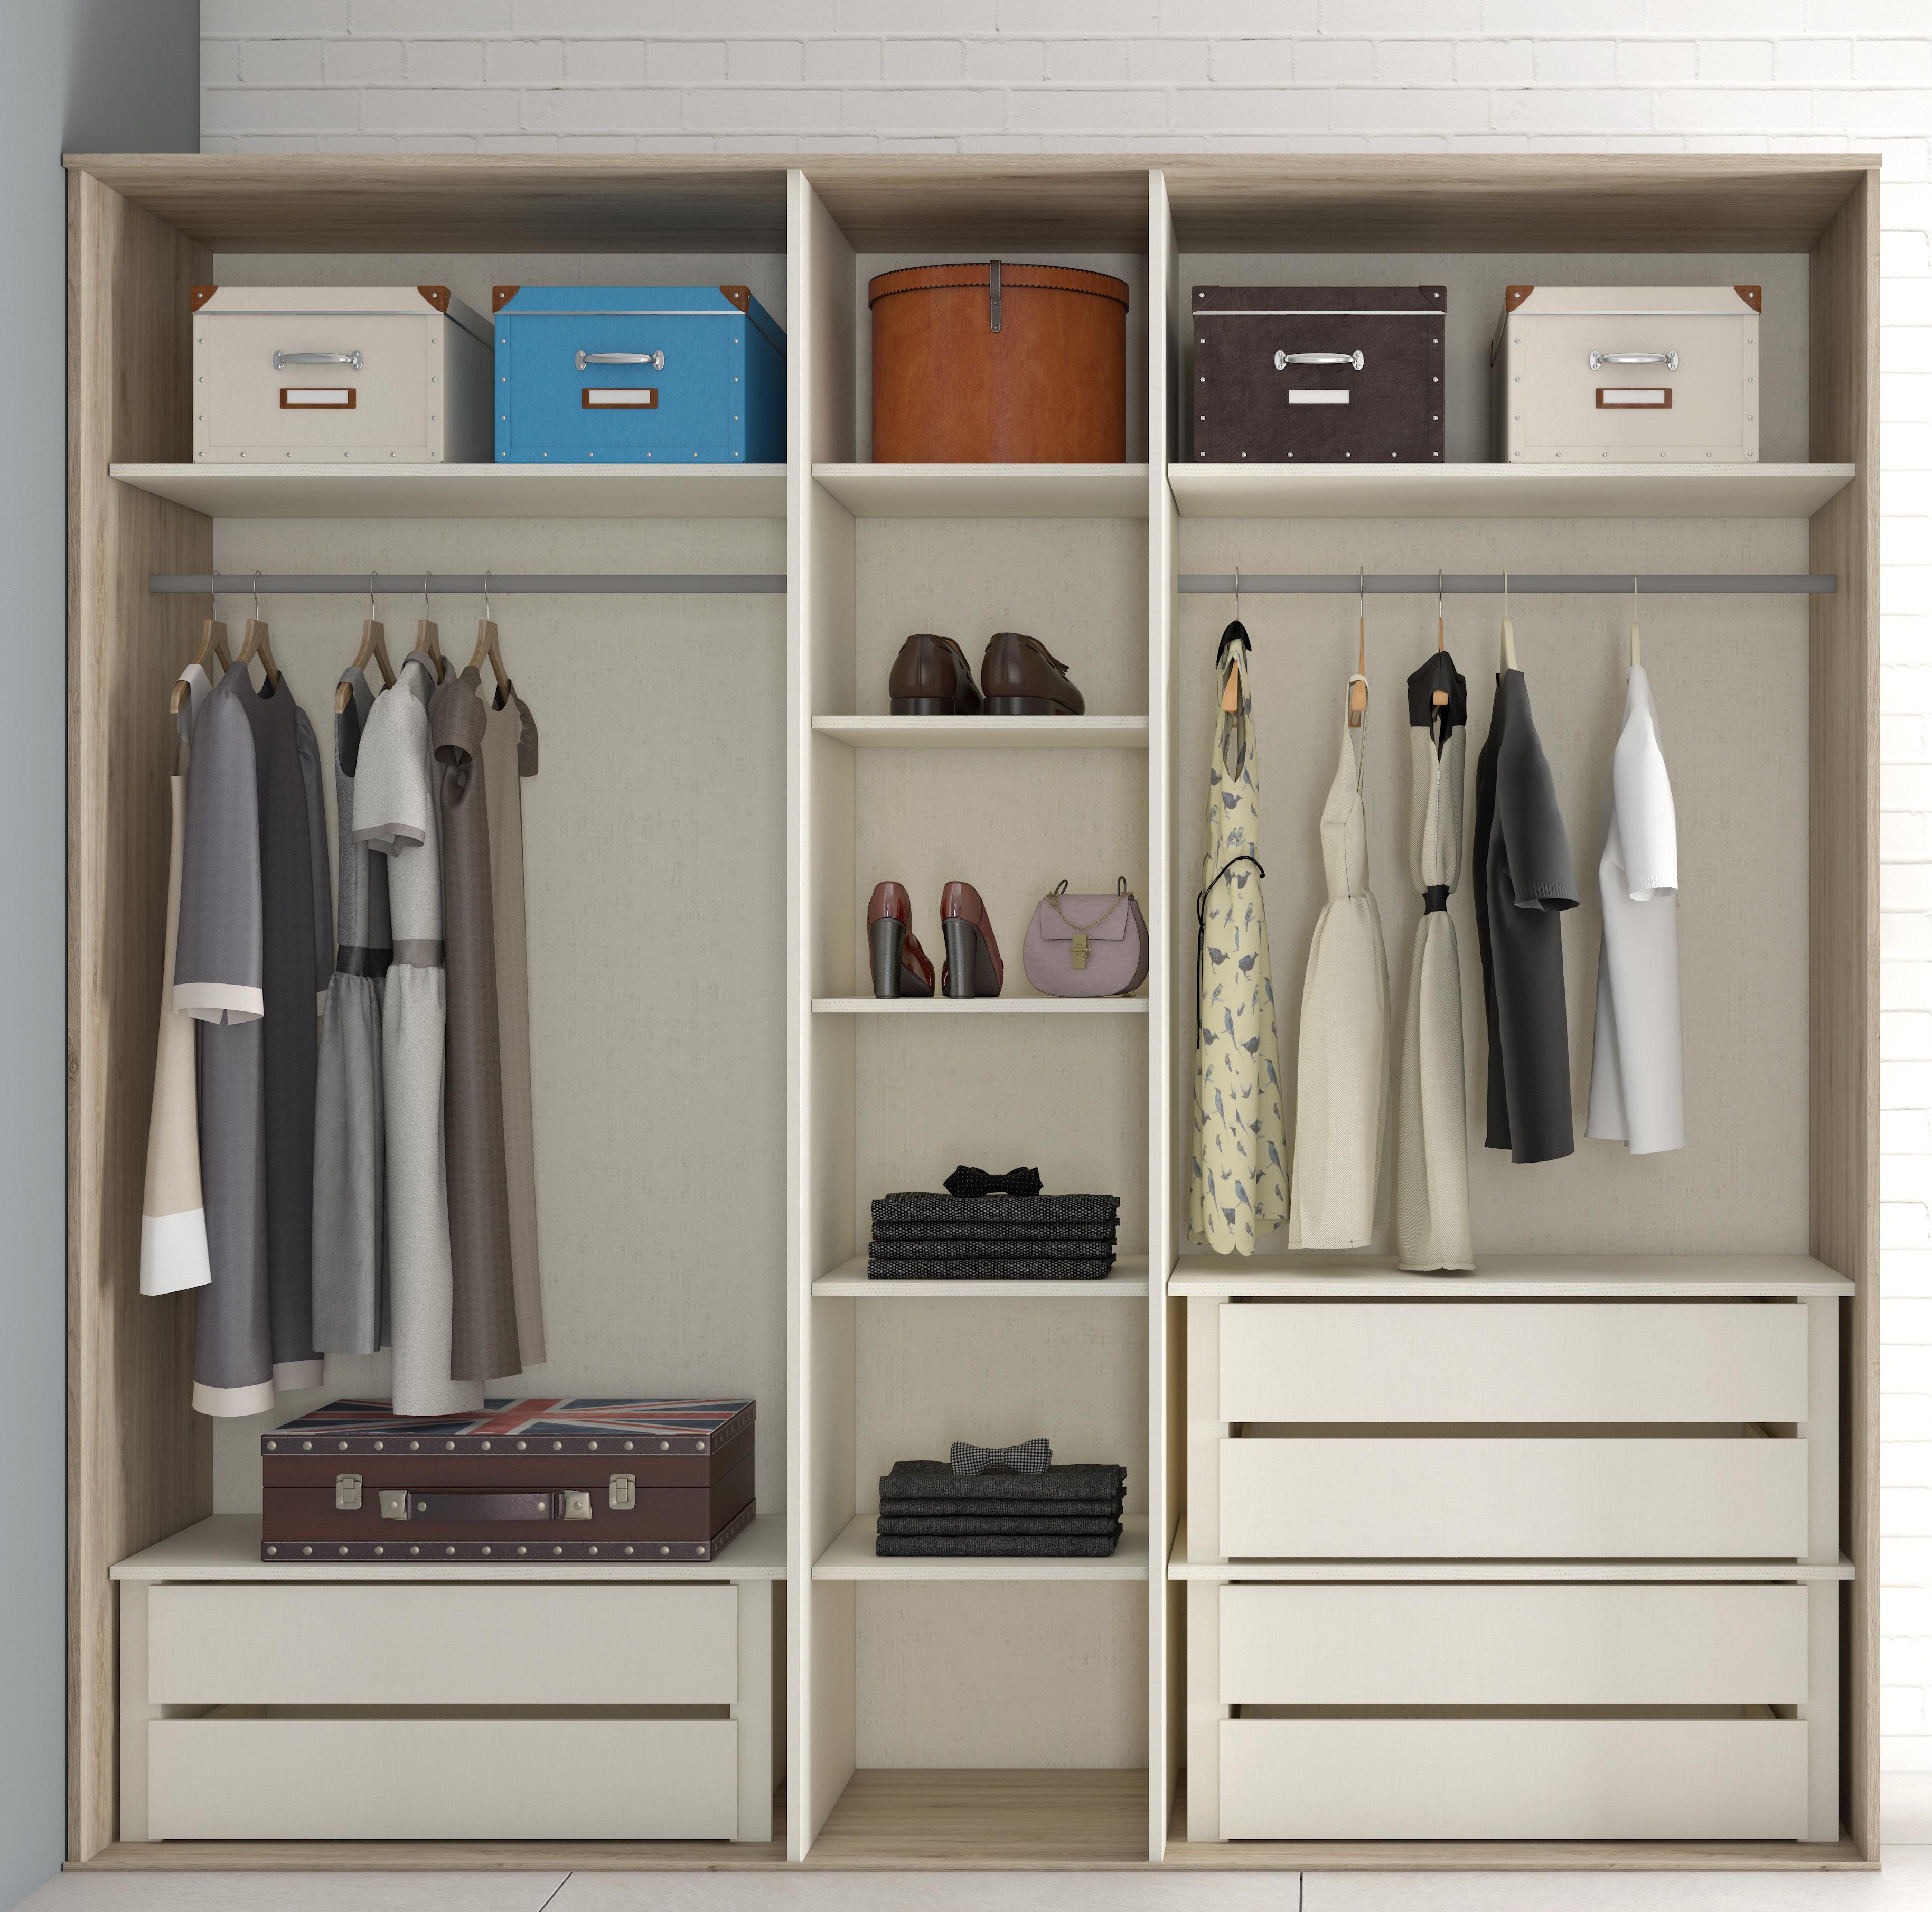 mueble-dormitorio-armario-madera-melamina-moderno-economico-roble ...